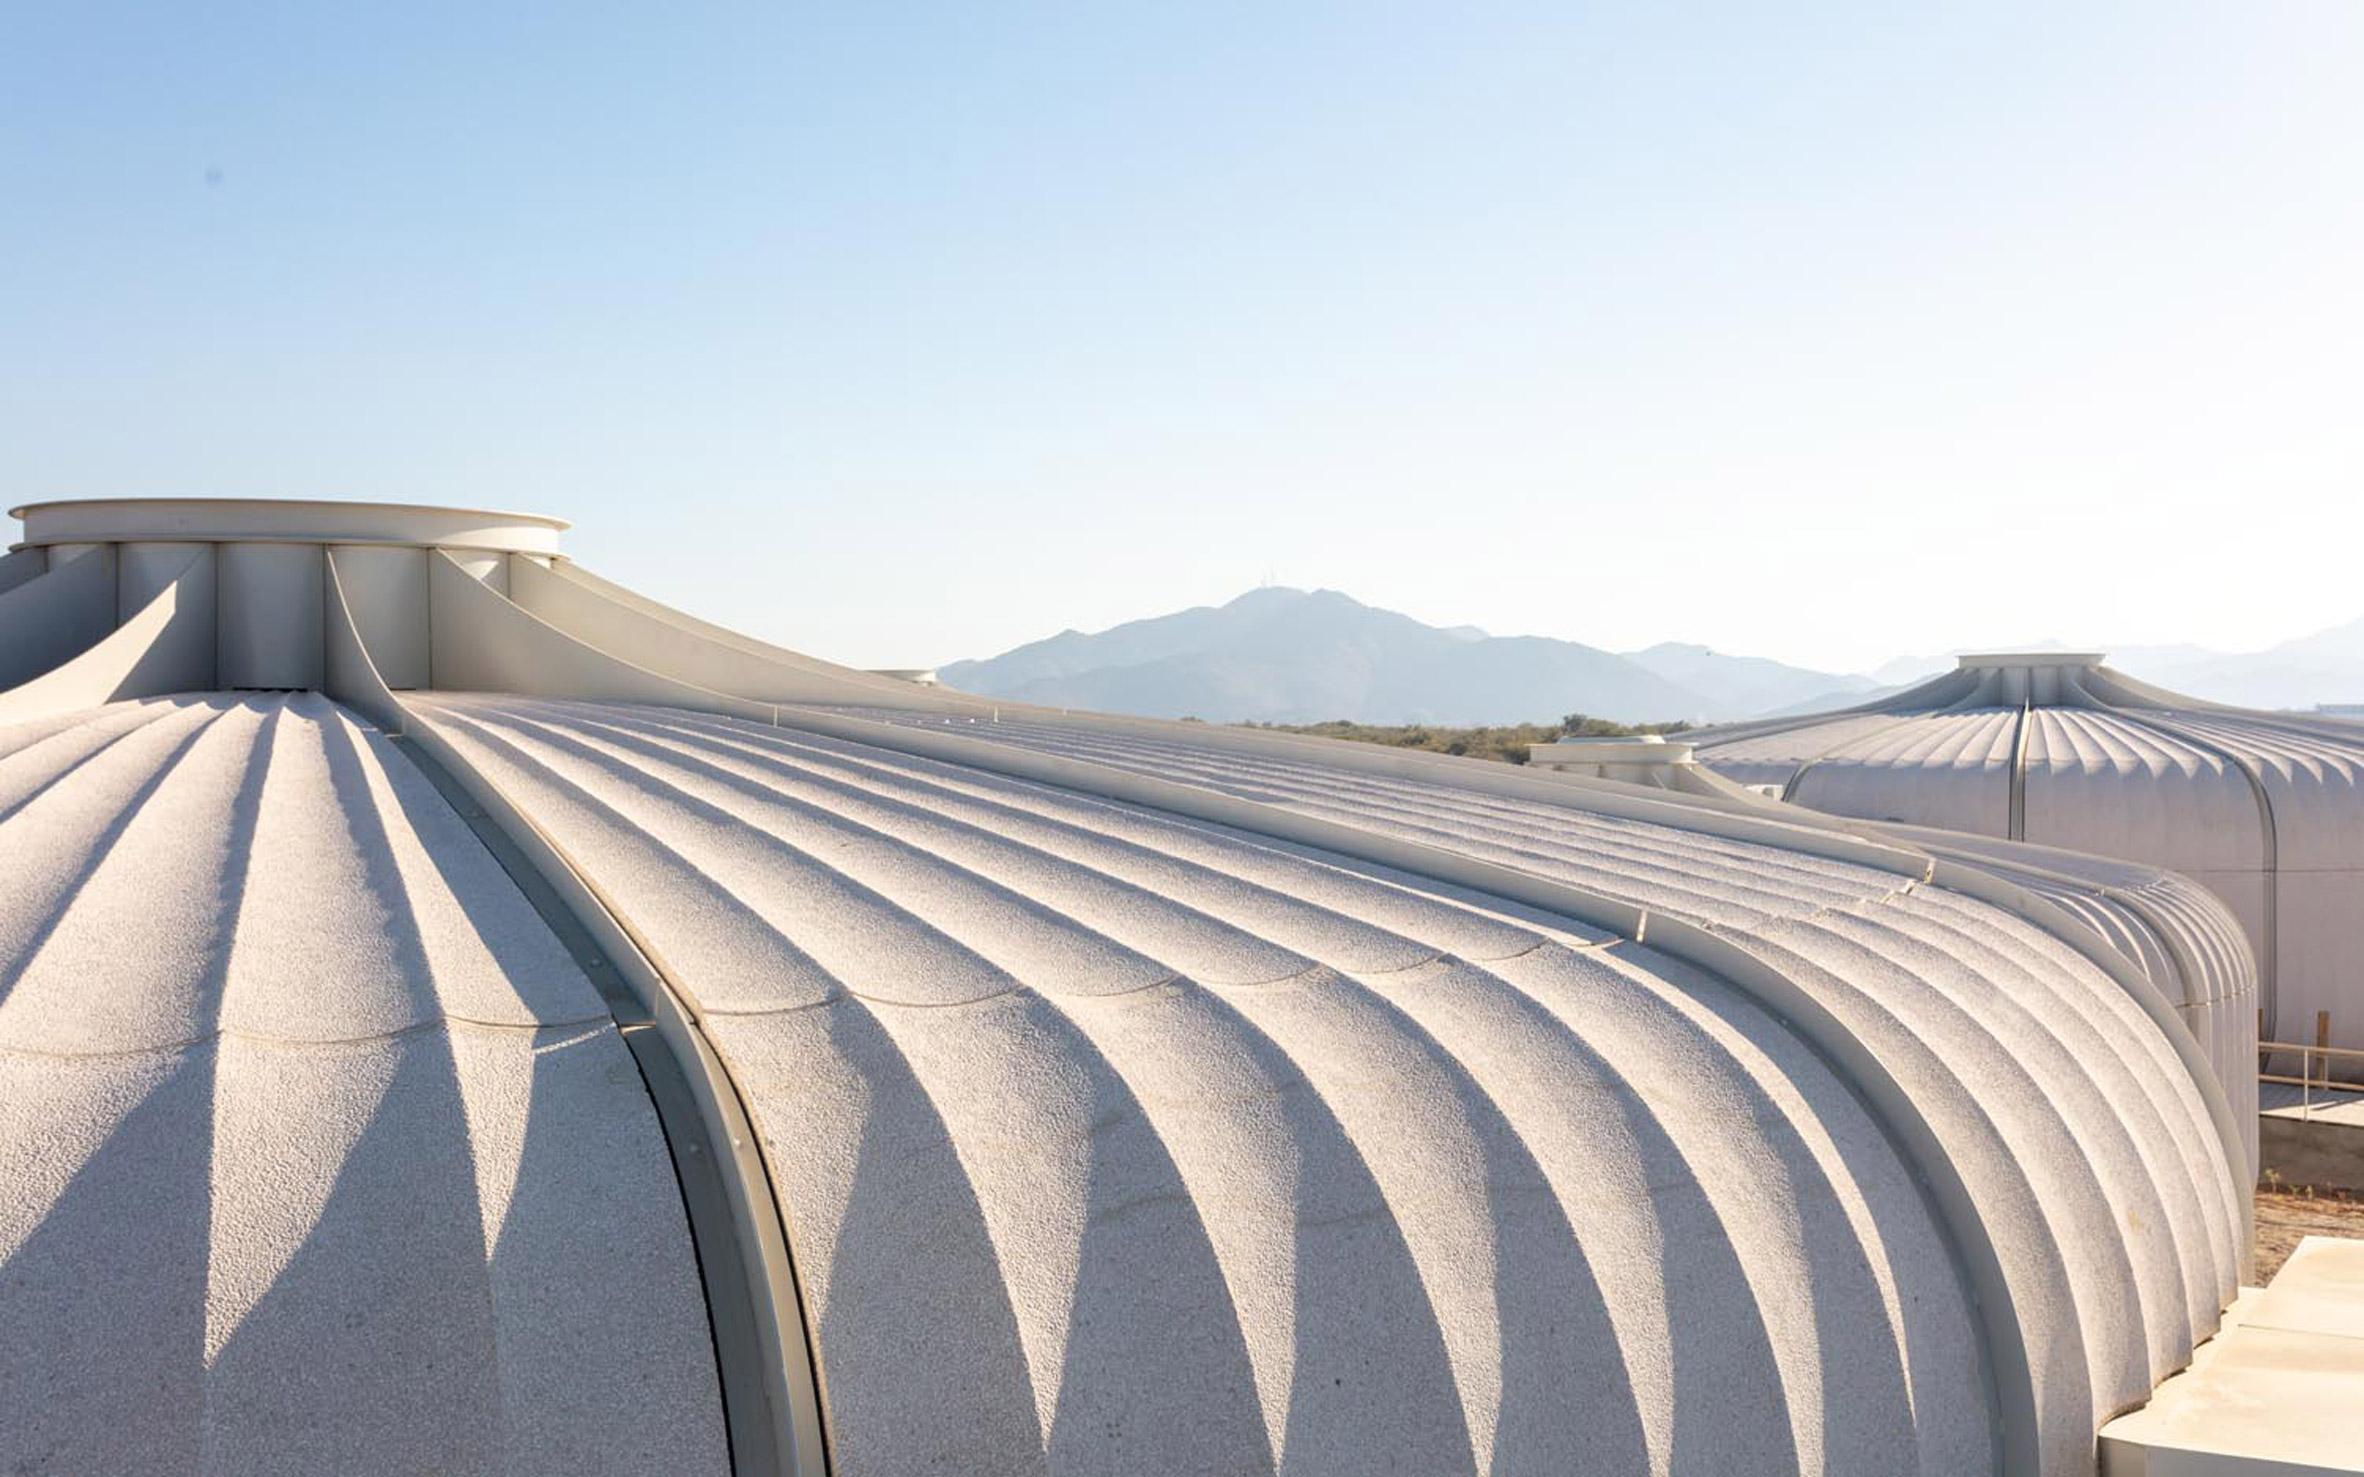 Prefabricated concrete pods